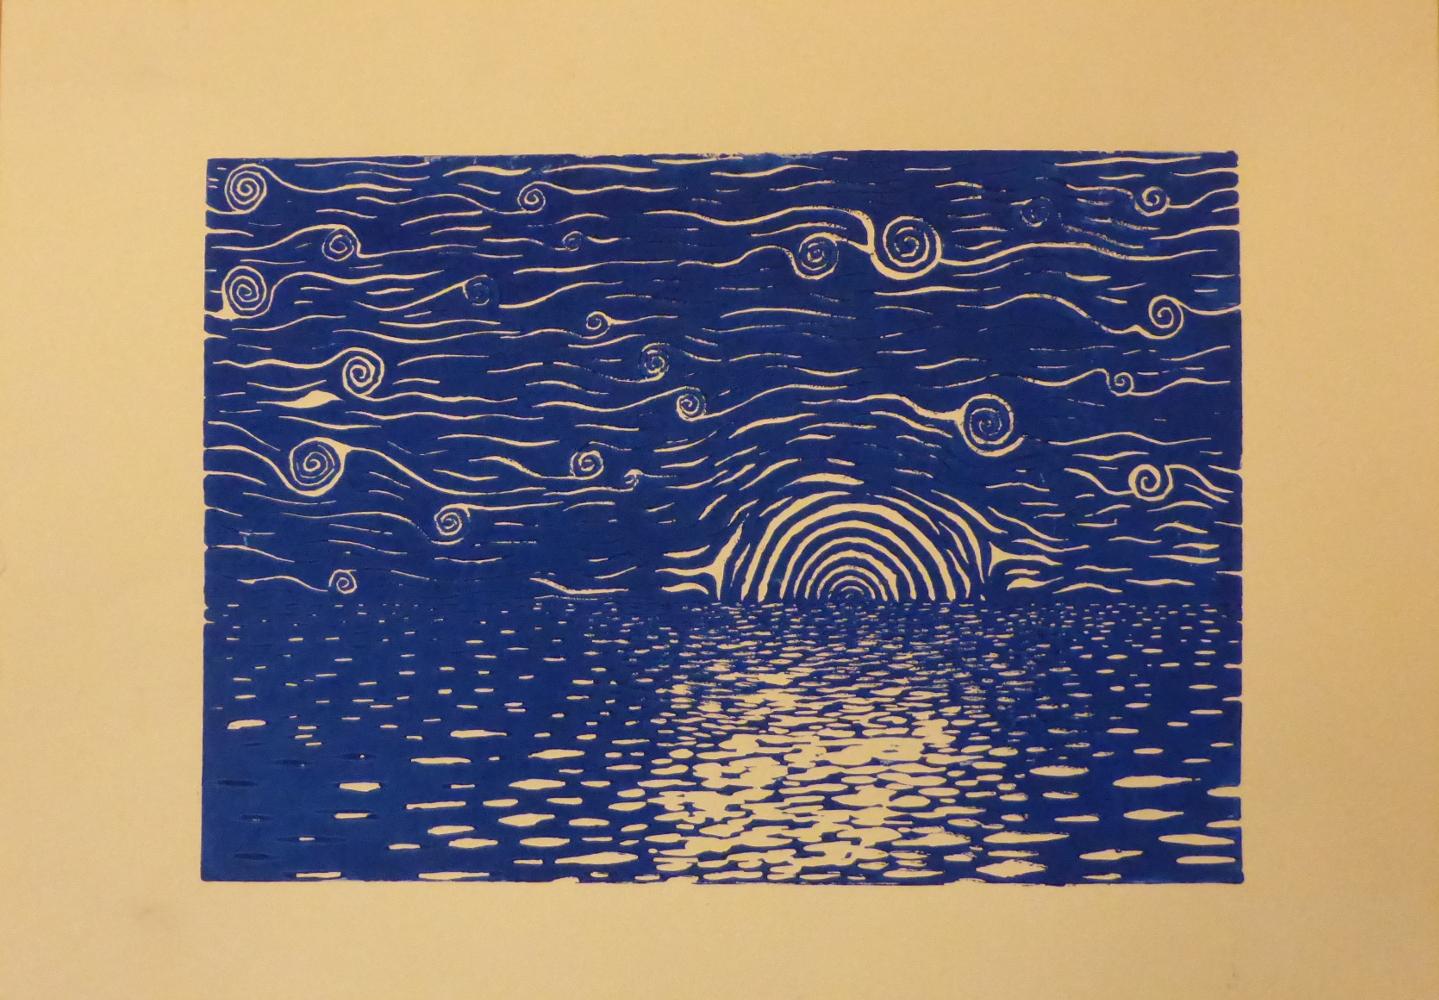 """Starry night I"", 2018, linocut on paper, 42 x 30 cm"